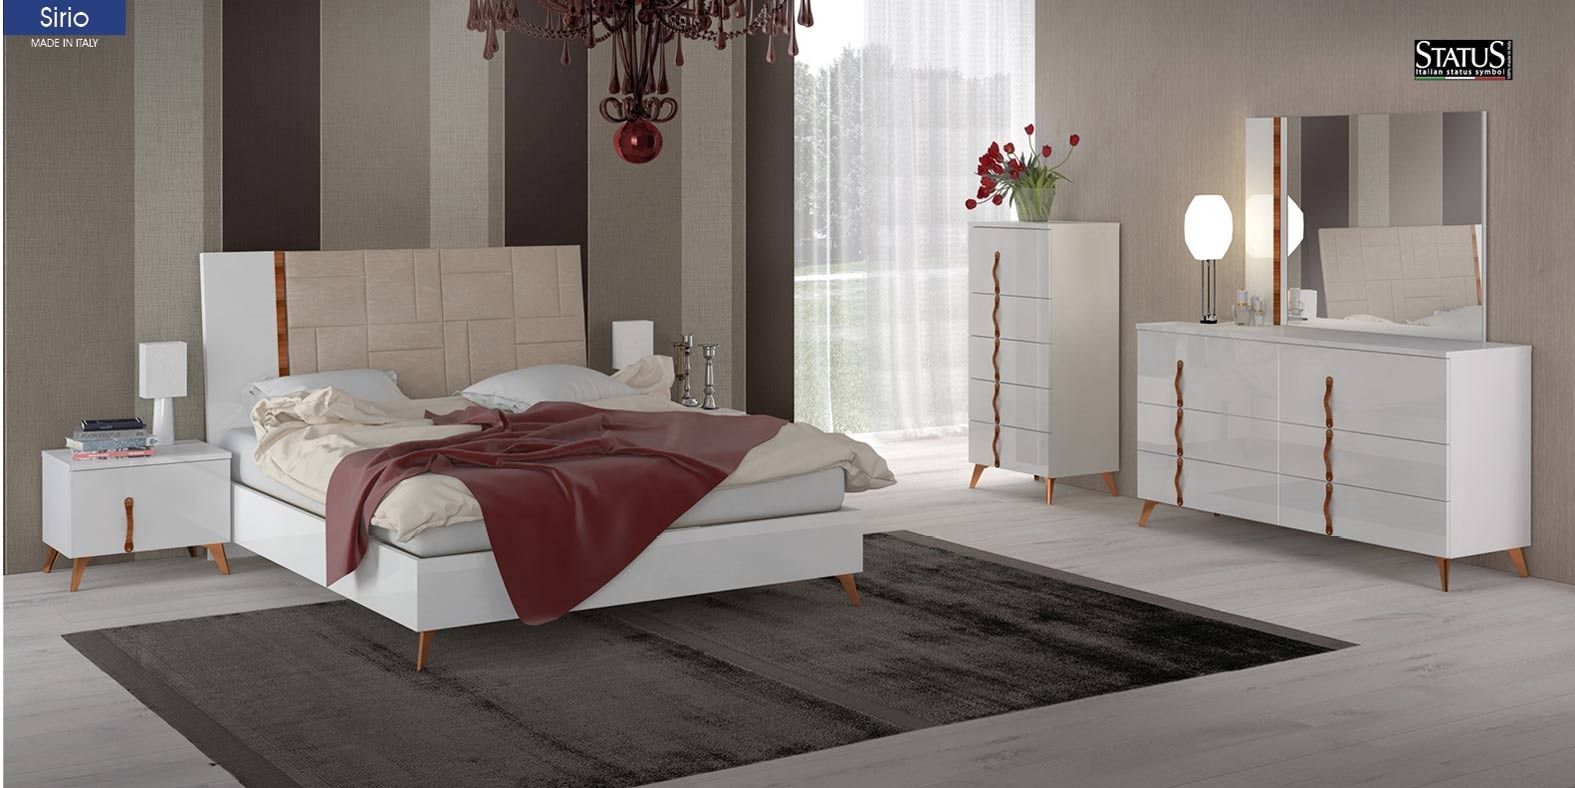 Sirio Modern Bedroom Set in White Italian Finish